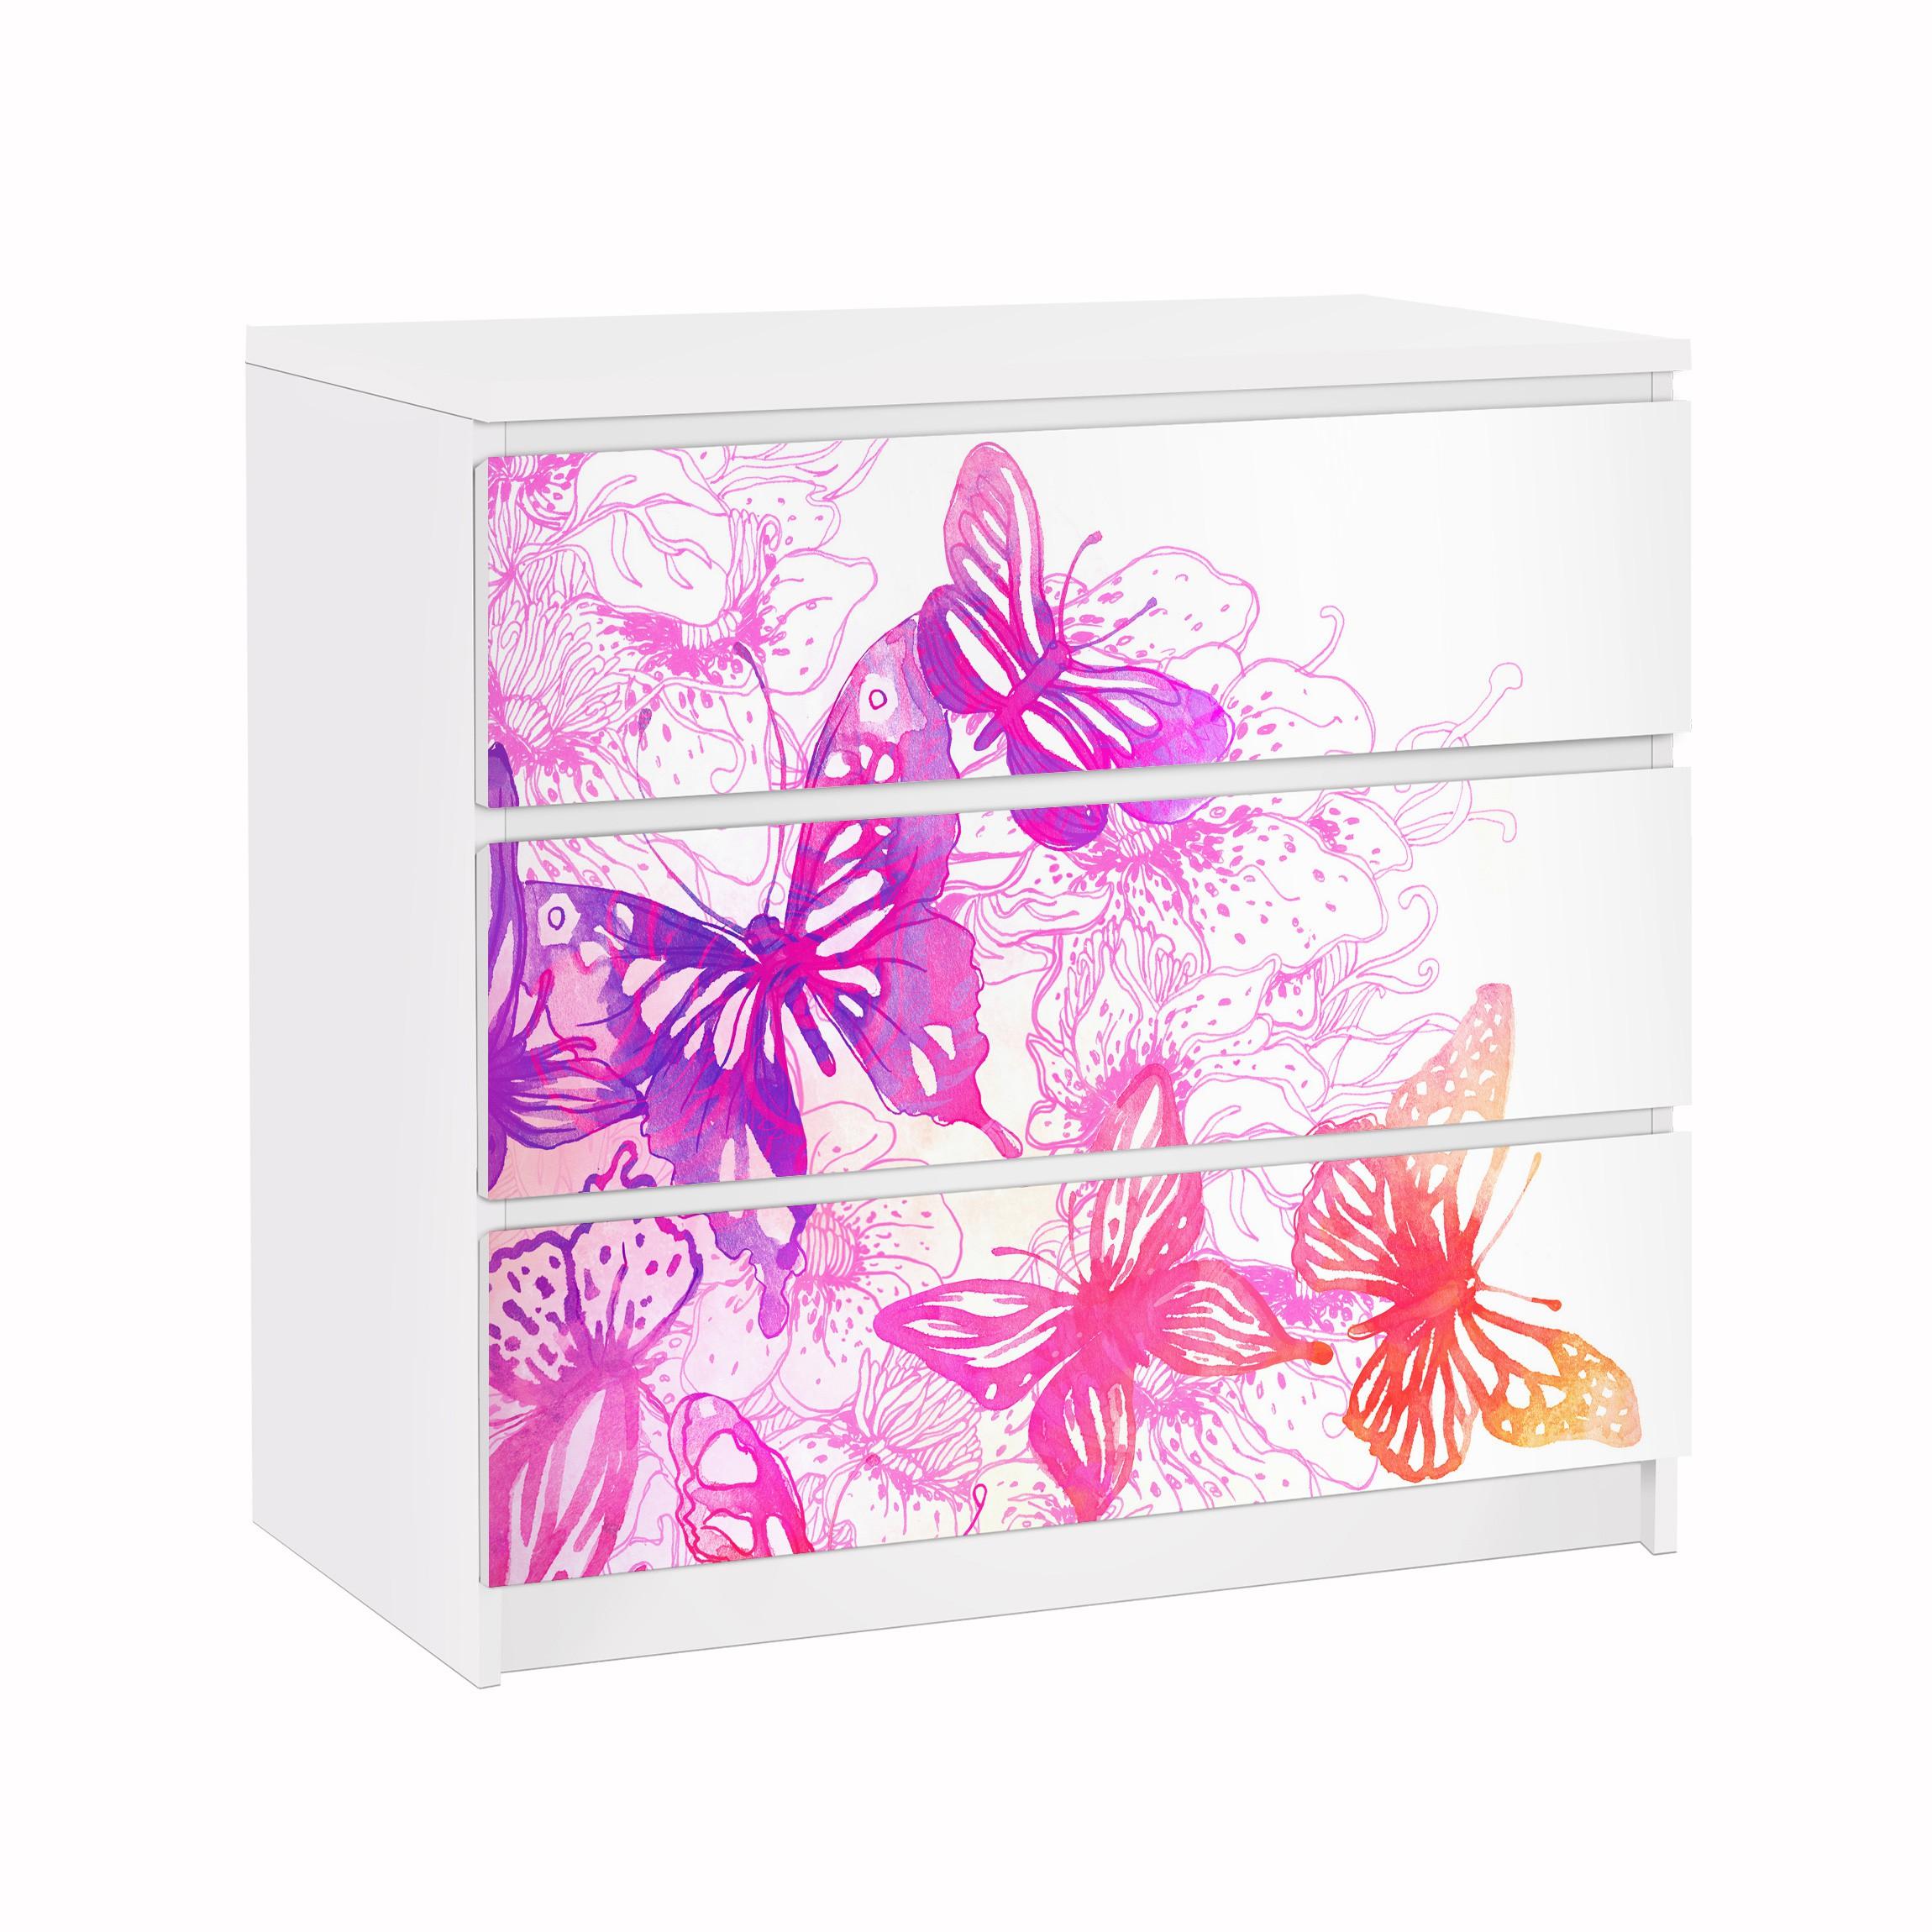 Carta adesiva per mobili ikea malm cassettiera 3xcassetti butterfly dream - Carta adesiva per mobili ikea ...